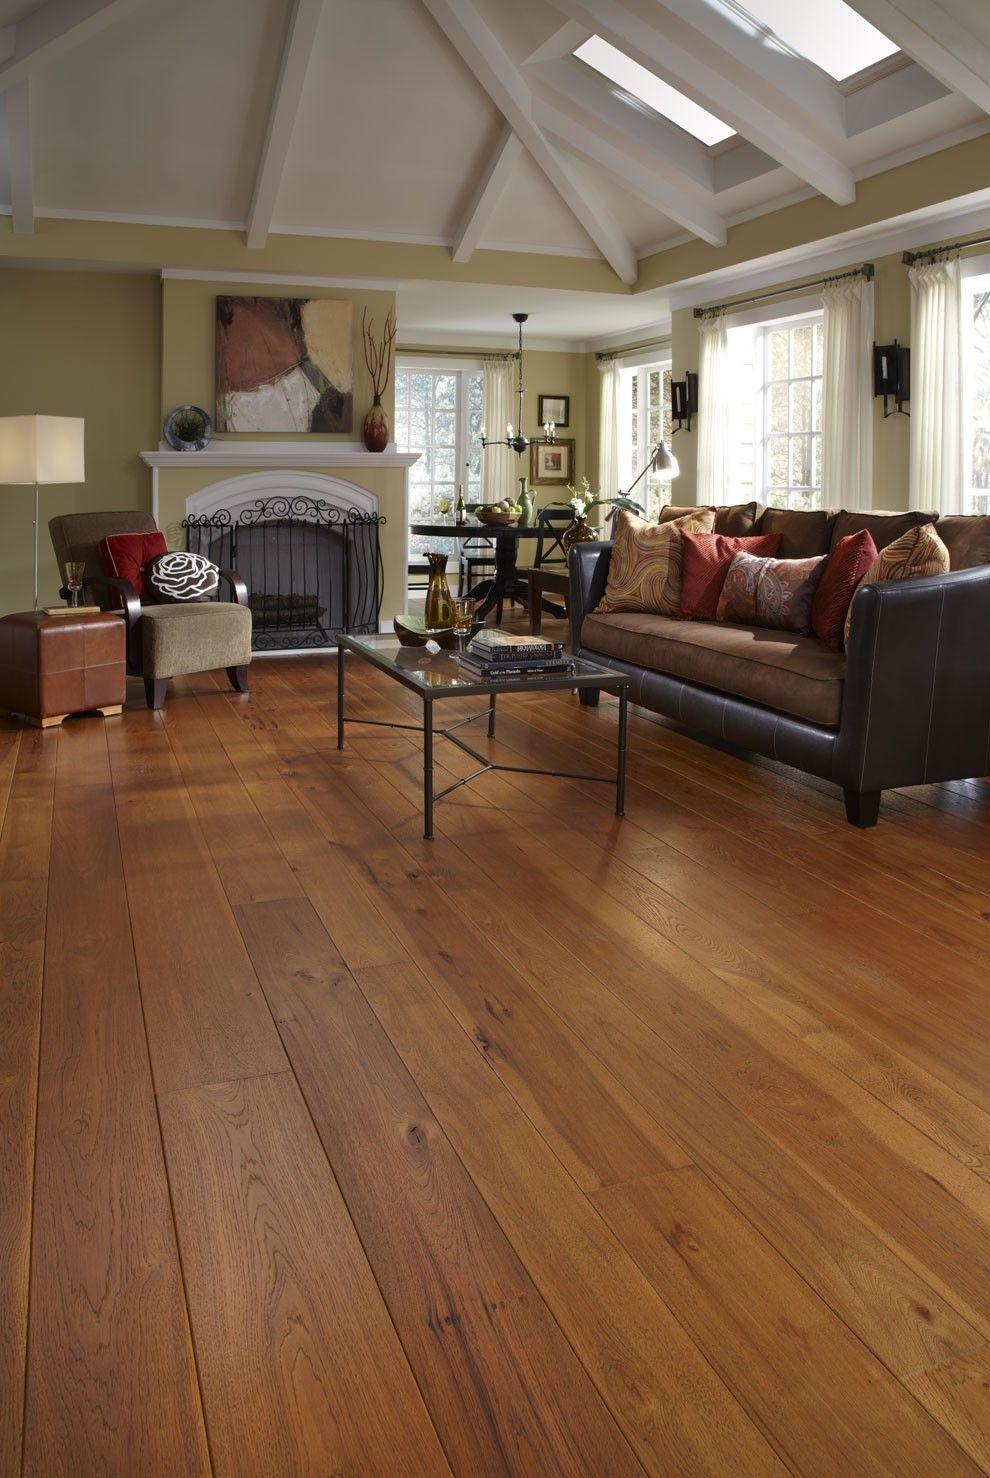 Wide Plank solid Hardwood Flooring Of Brushed Hickory Living Room Design Magic Pinterest Living In Brushed Hickory Living Room